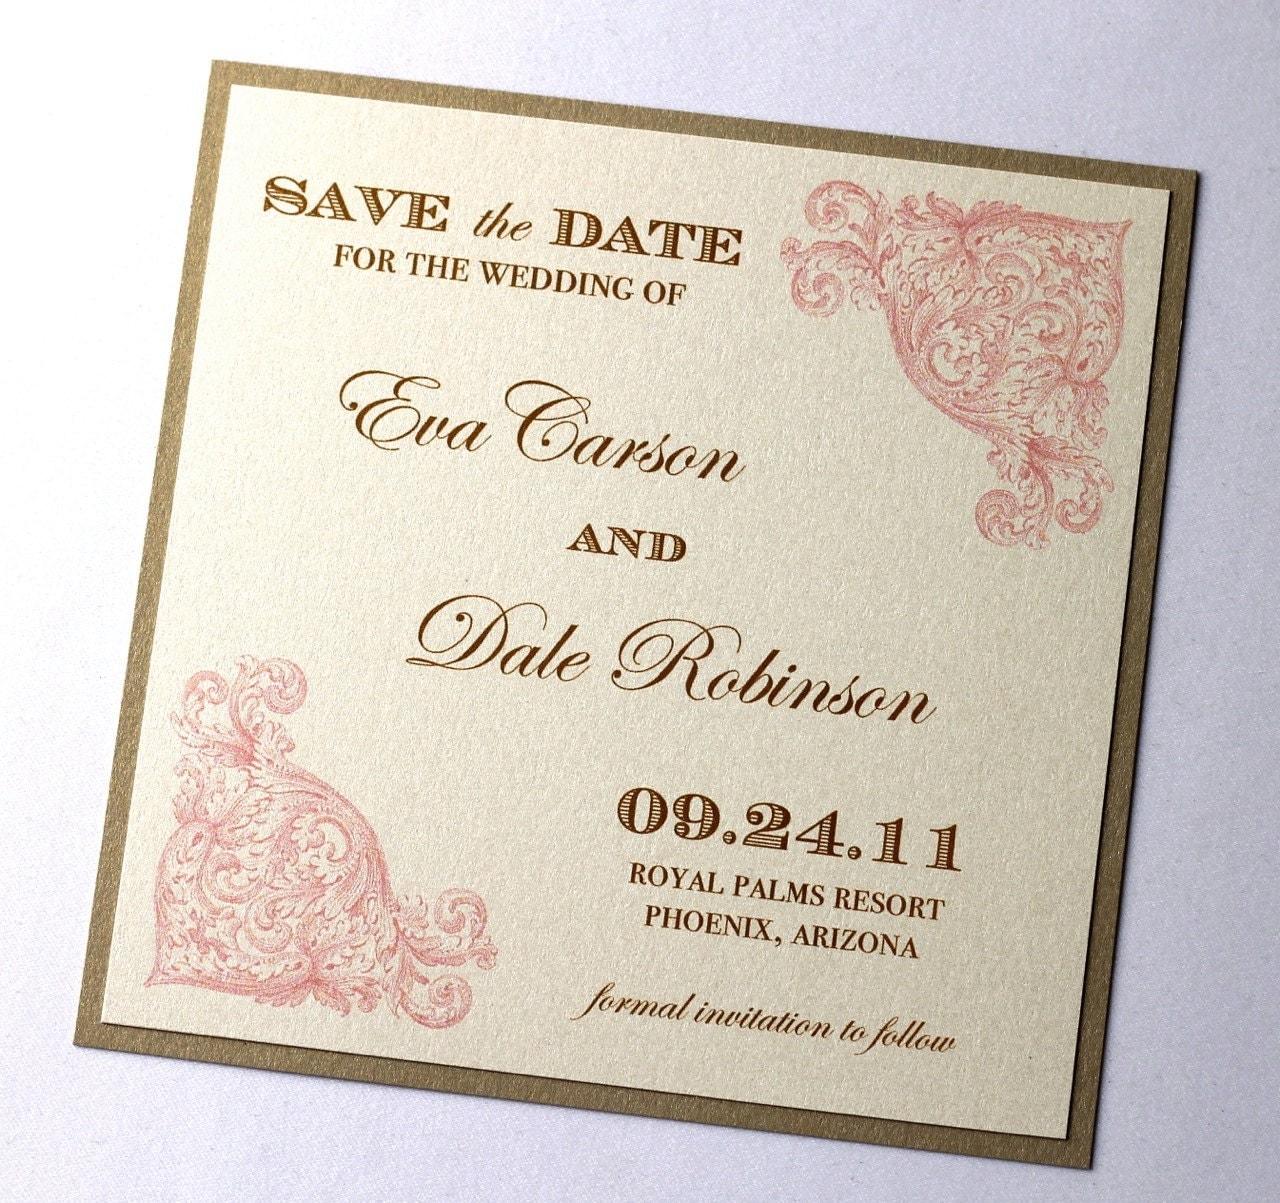 Eva Vintage Wedding Save the Date Sample Vintage Style